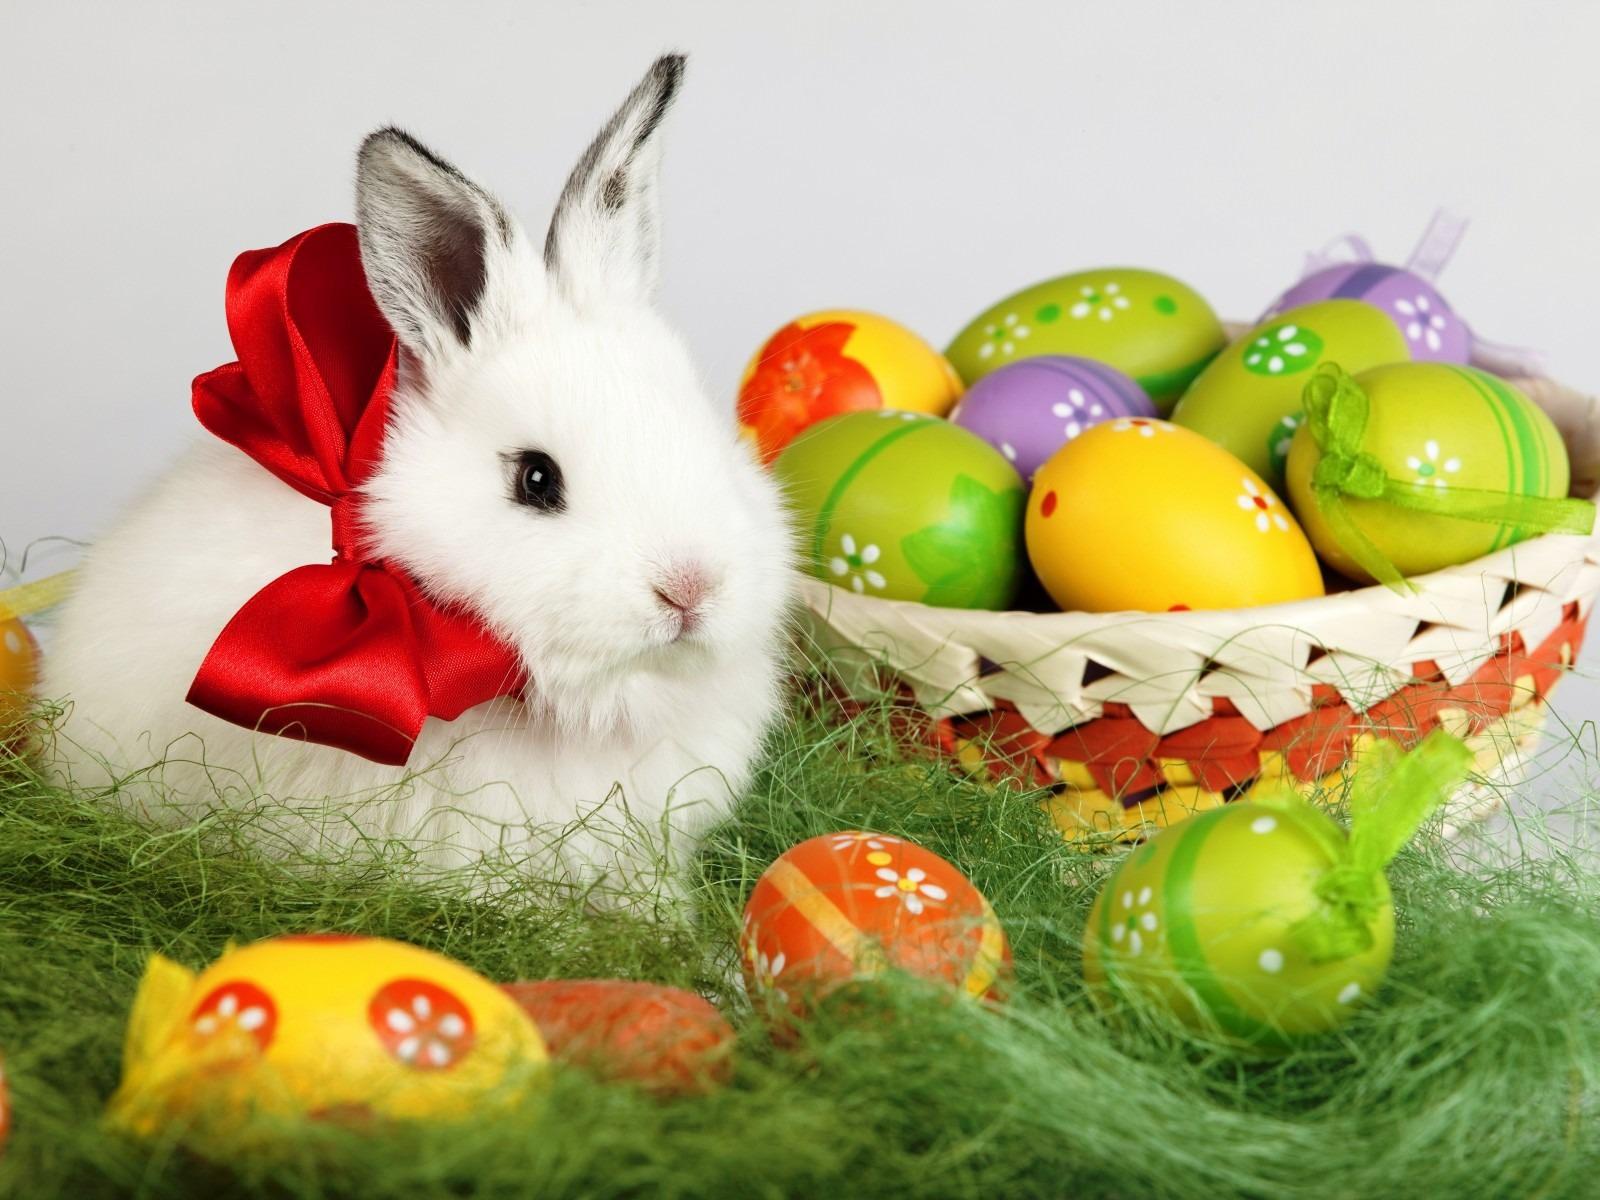 30 easter bunny wallpapers backgrounds images - Easter desktop wallpaper ...